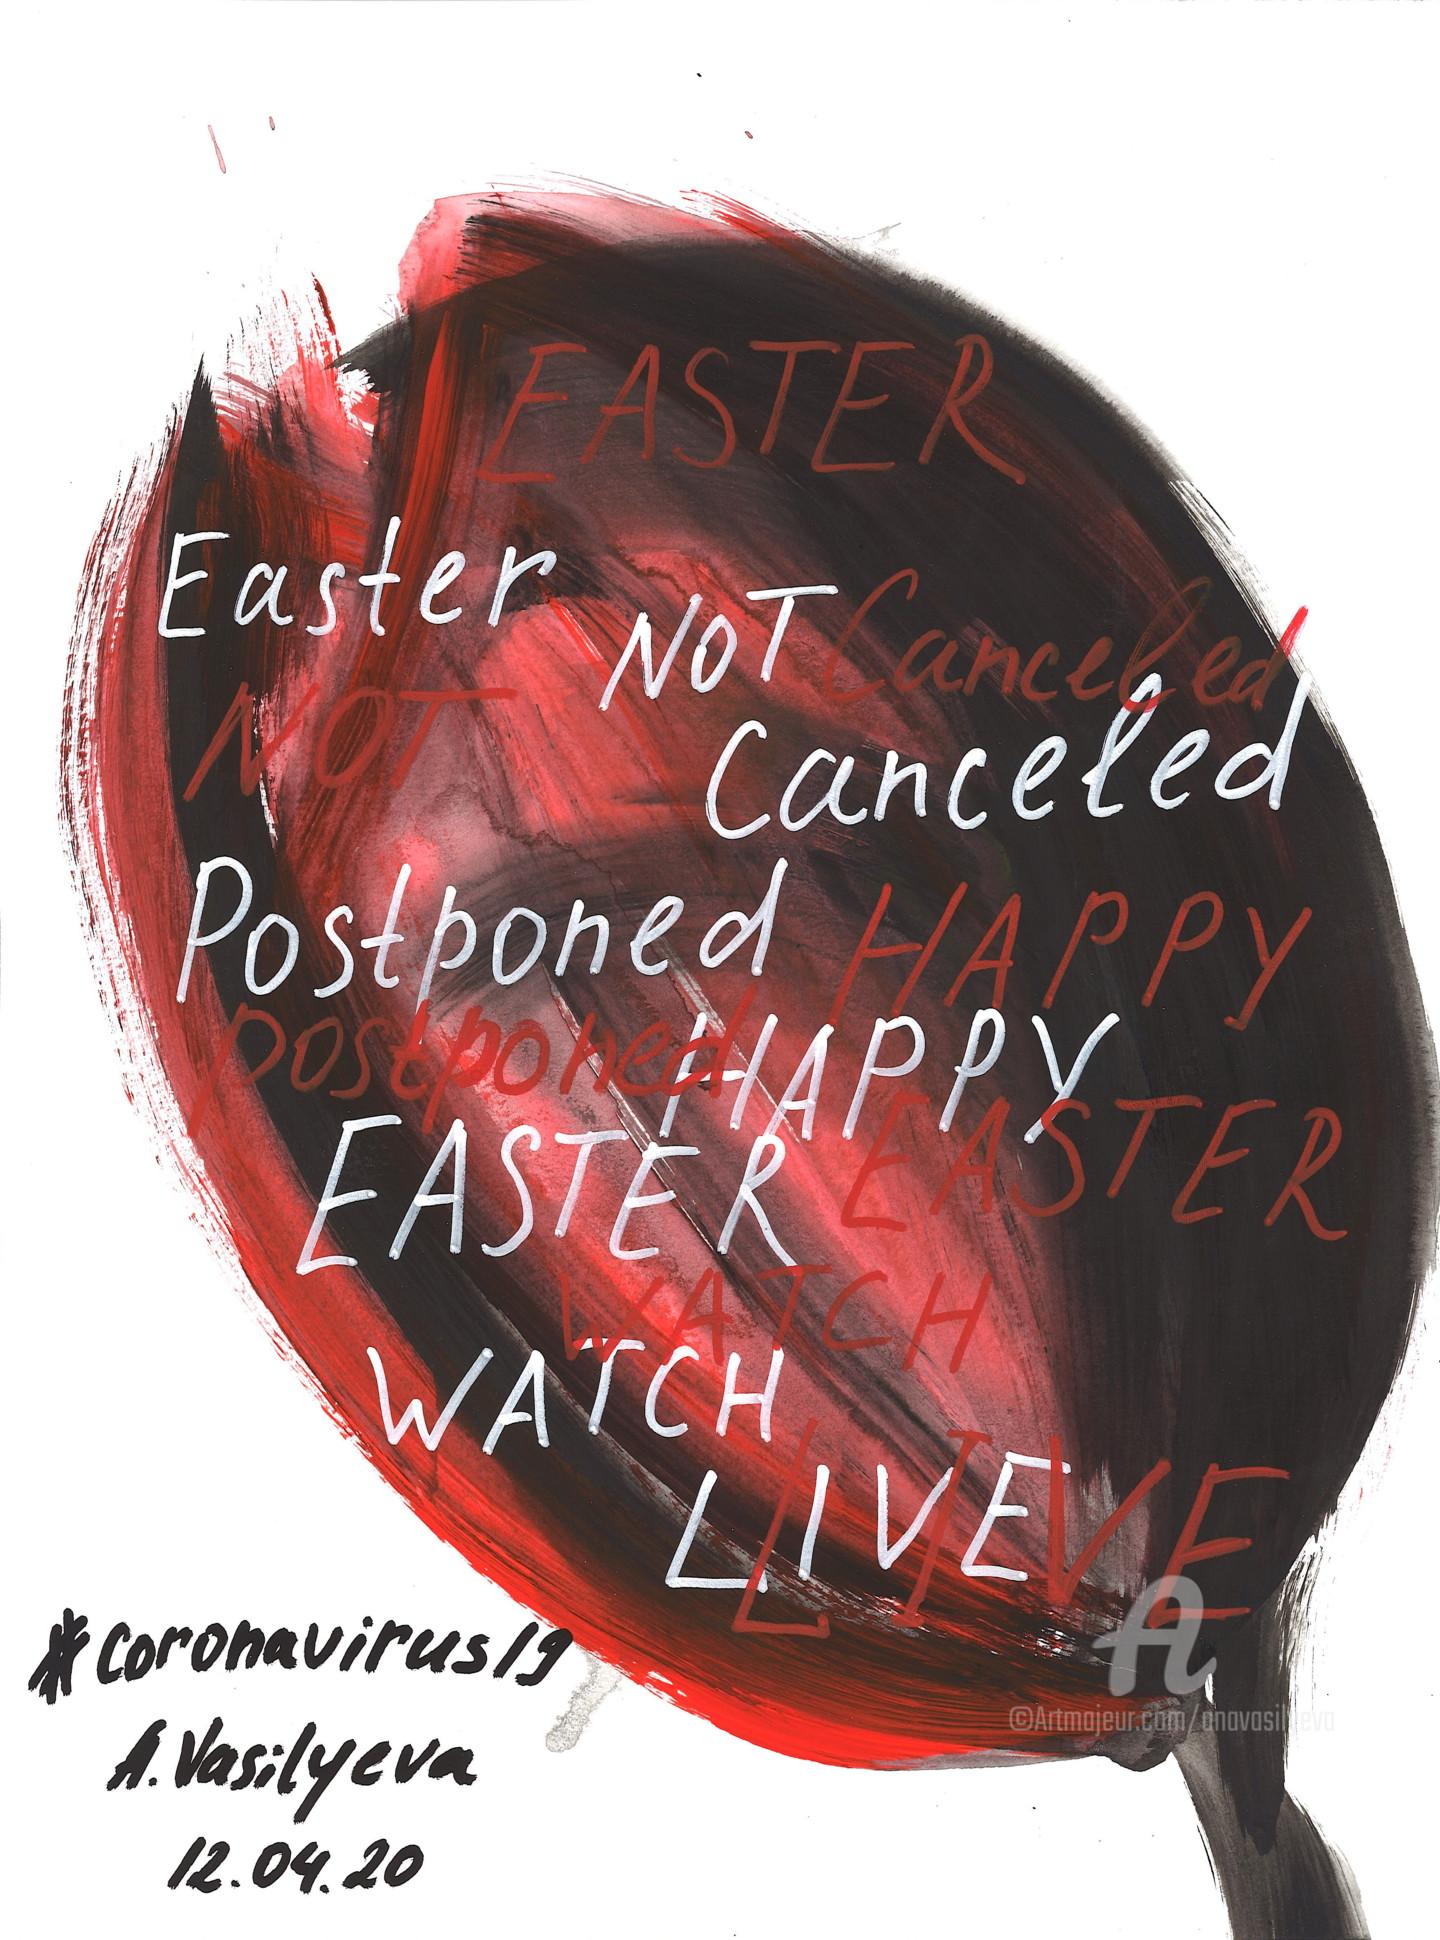 Anastasia Vasilyeva - 12.04.2020 - Happy Easter. COVID-19 Documentary art.